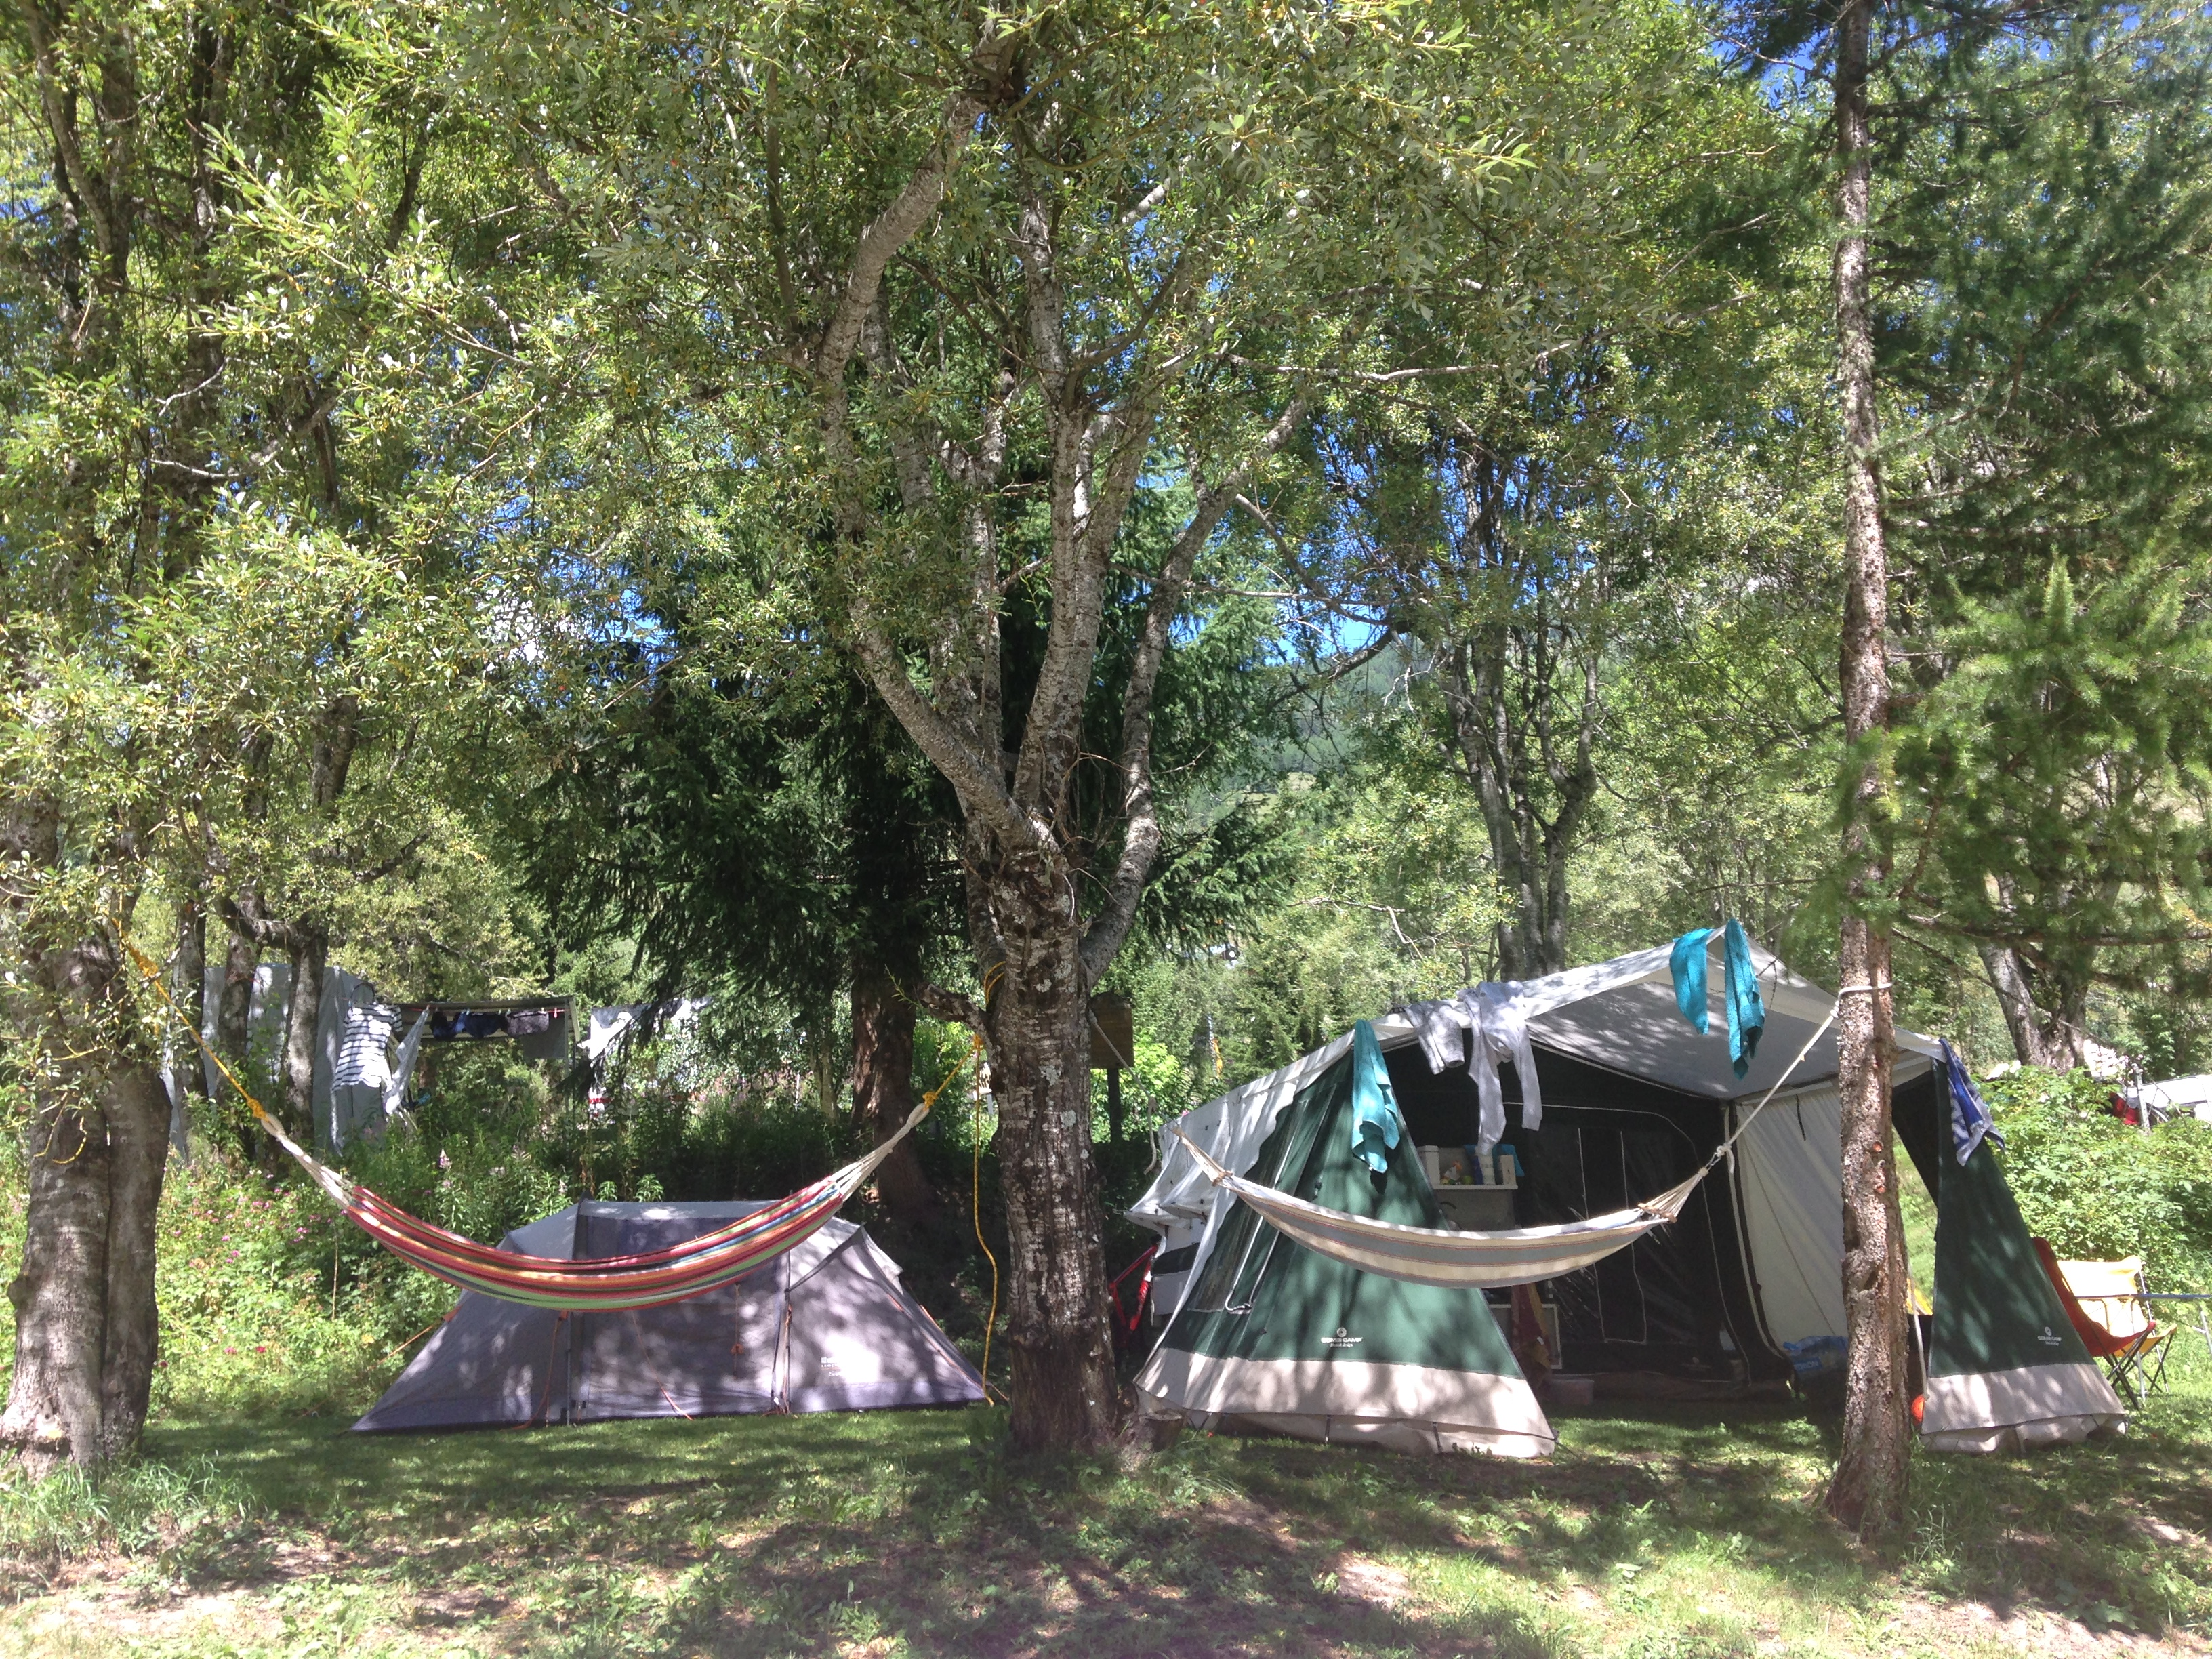 Camping-Lanchettes_peisey-nancroix_Ete17-001